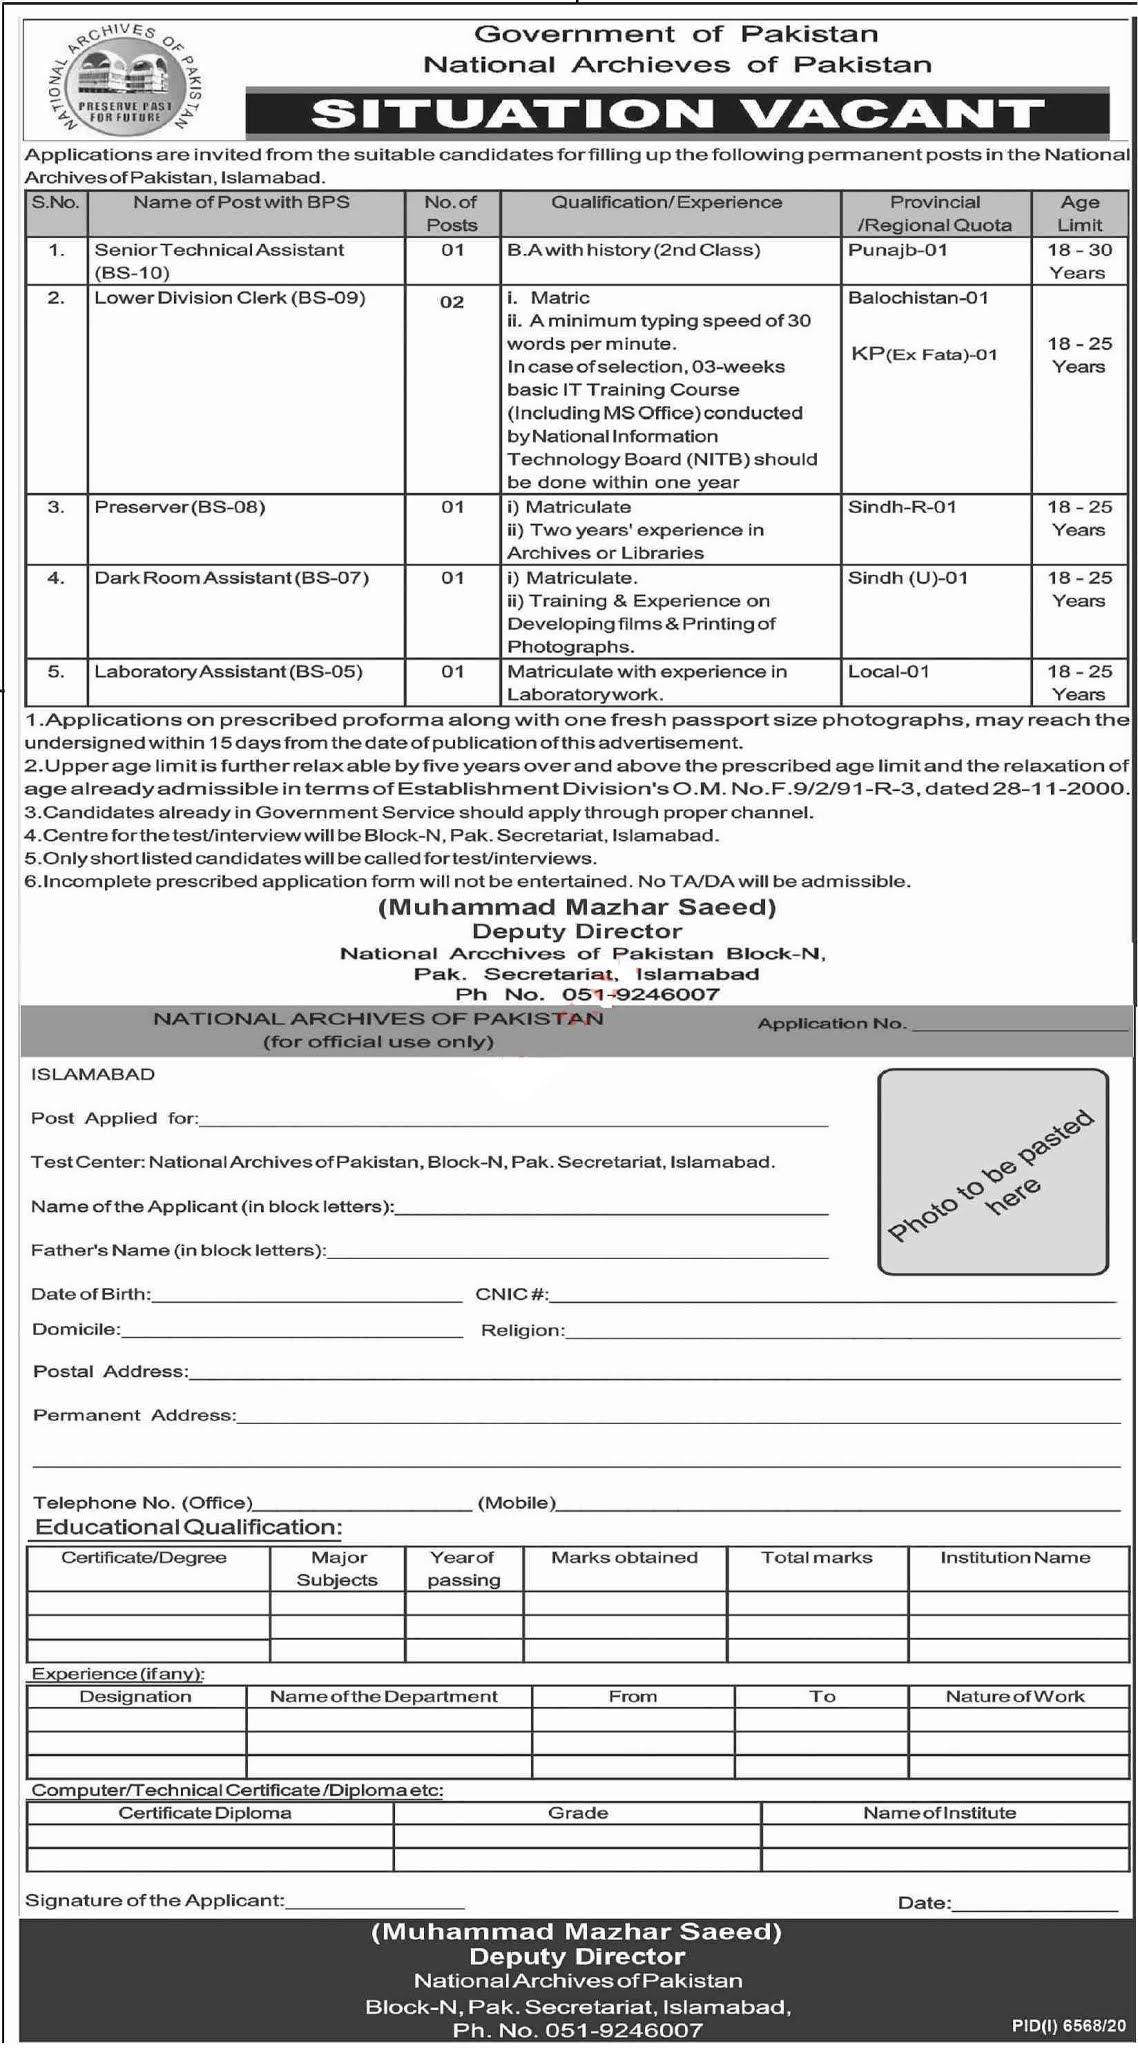 National Archives of Pakistan Jobs 2021 Technical Assistant, Senior Technical Assistant, Lower Division Clerk, LDC, Clerk, Preserver, Dark Room Assistant, Laboratory Assistant